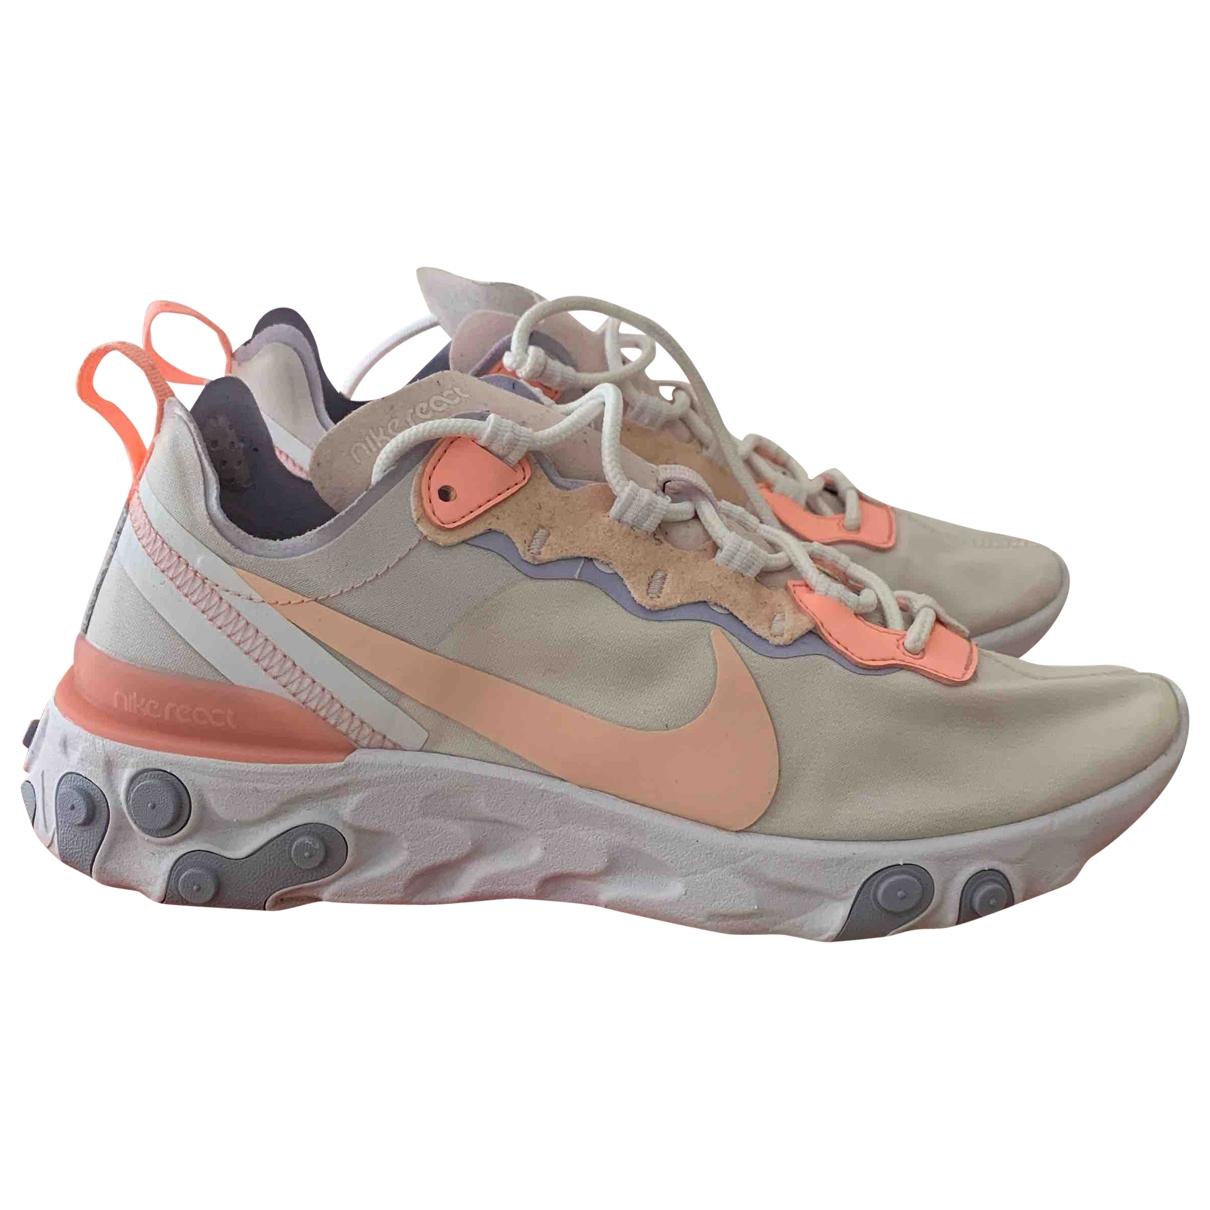 Nike React element 55 Sneakers in  Weiss Leinen